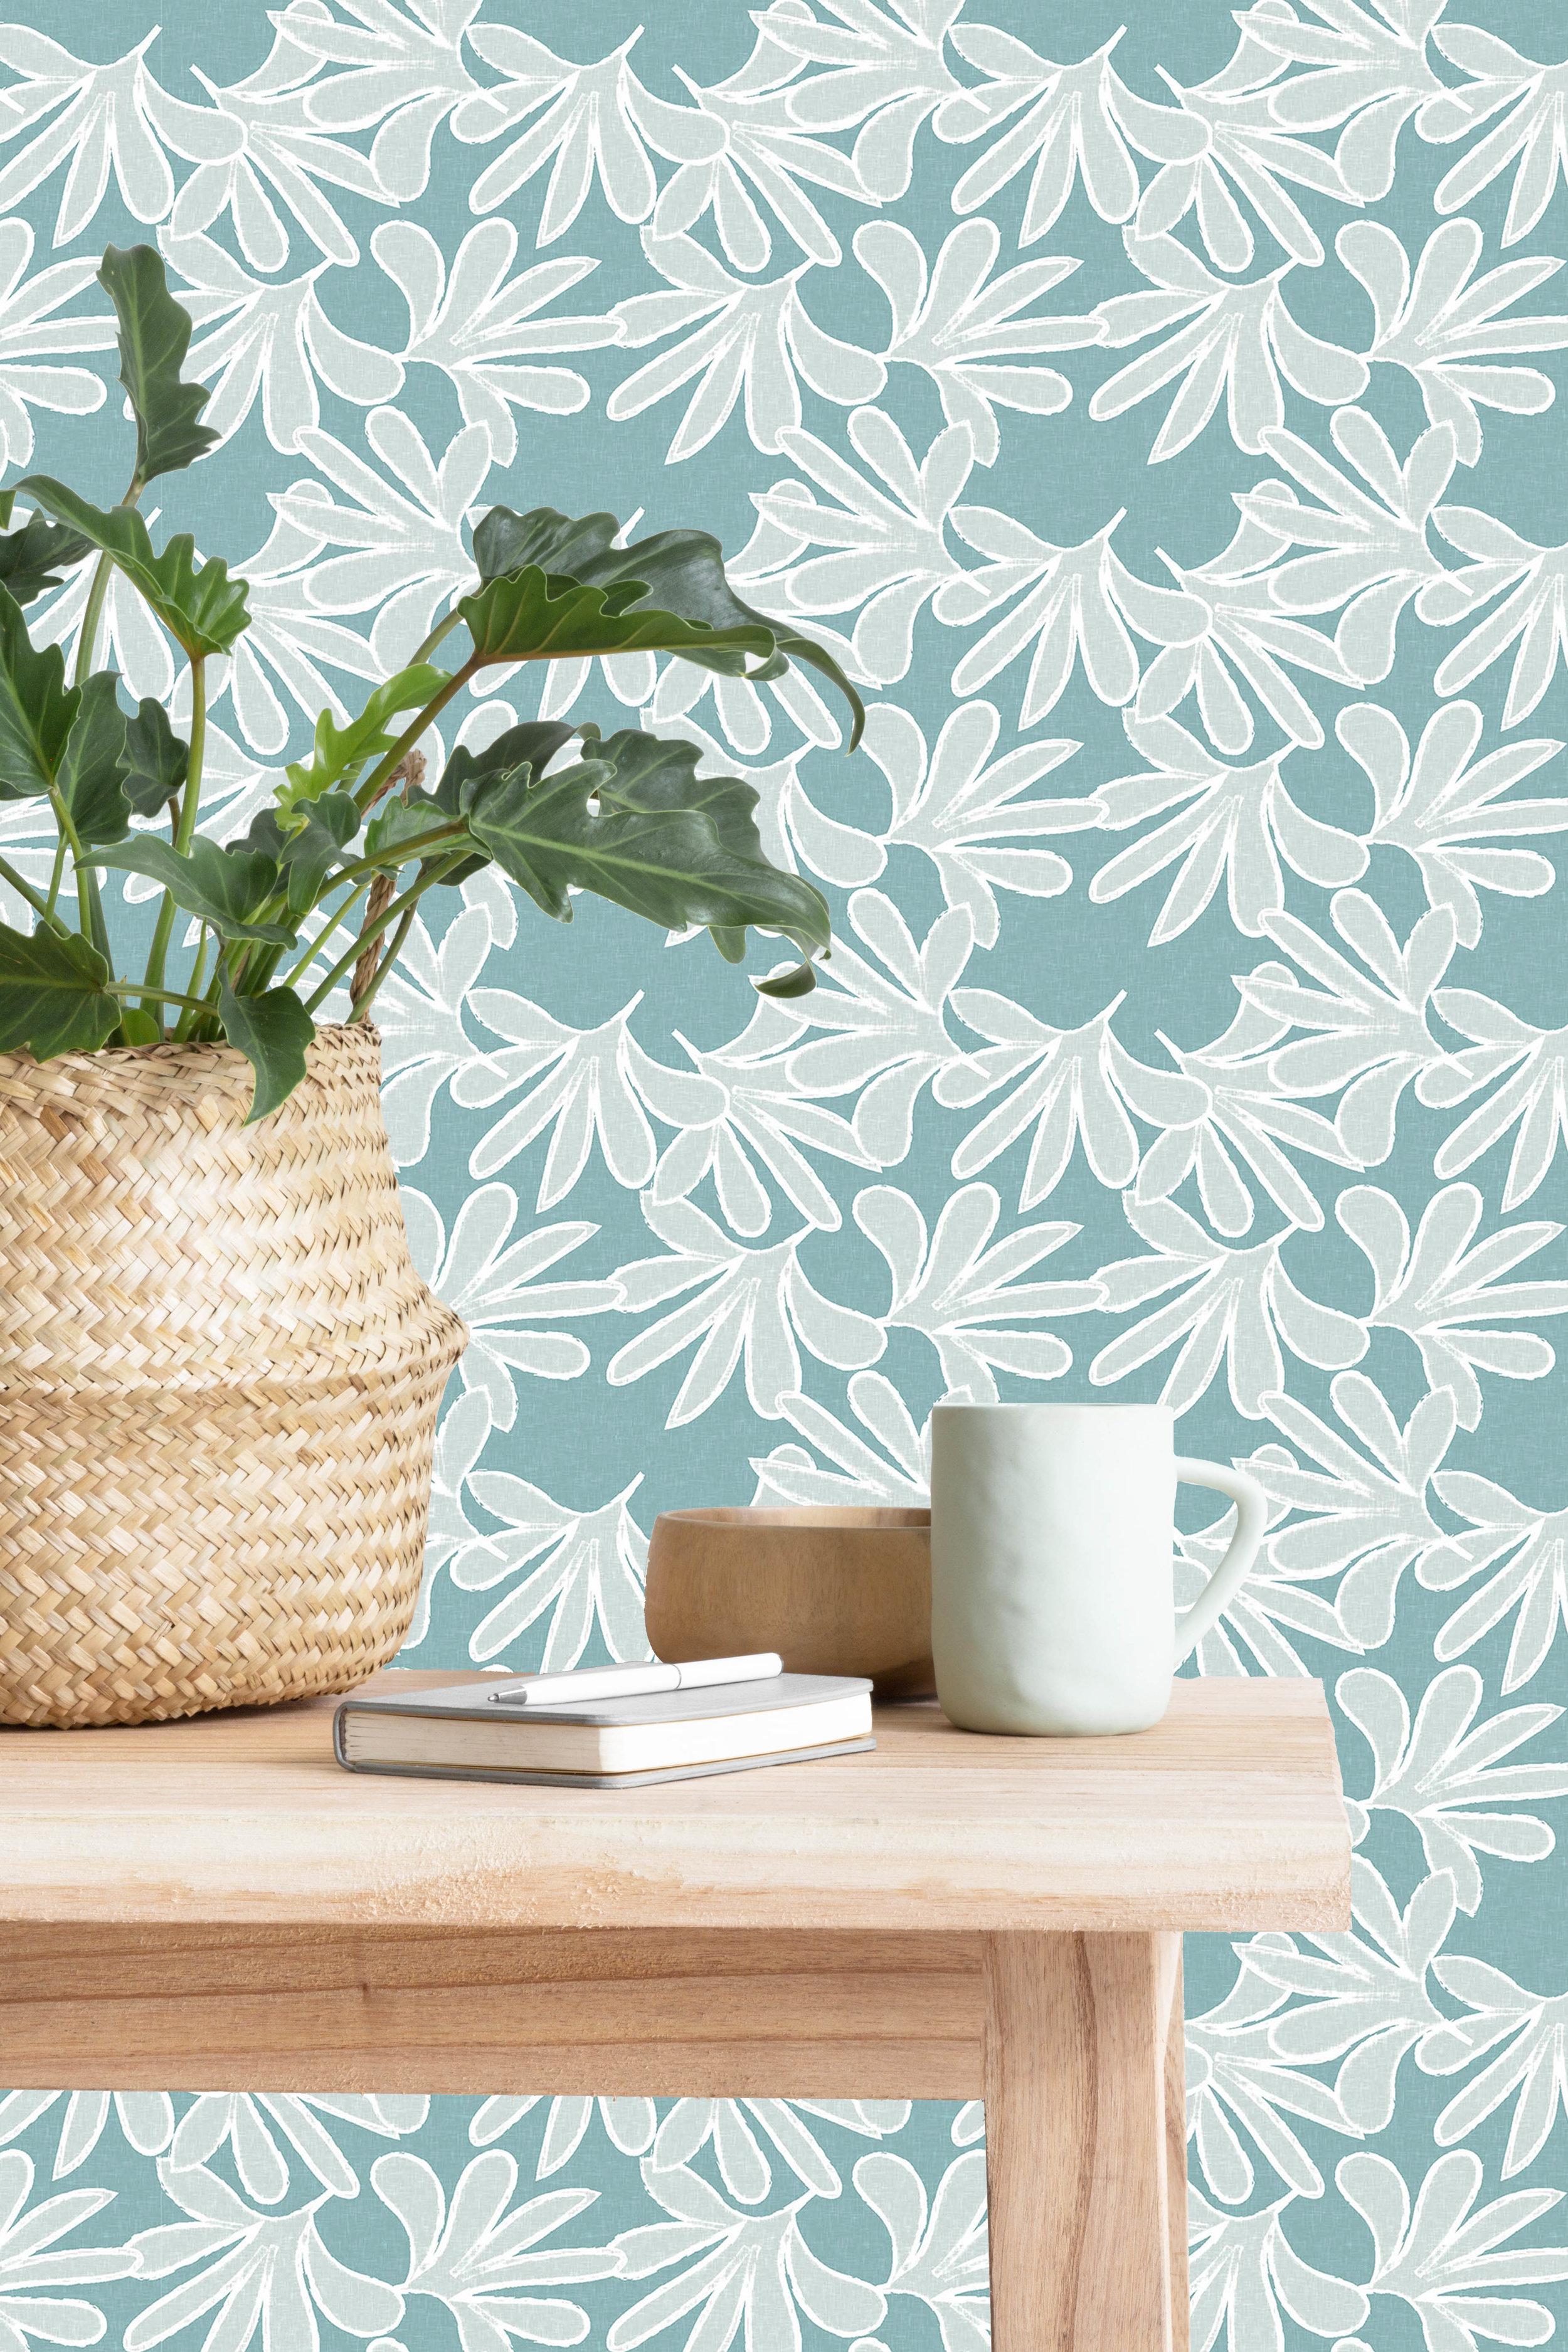 1. Frond Happy-Sea Breeze_Textured_Plant.jpg